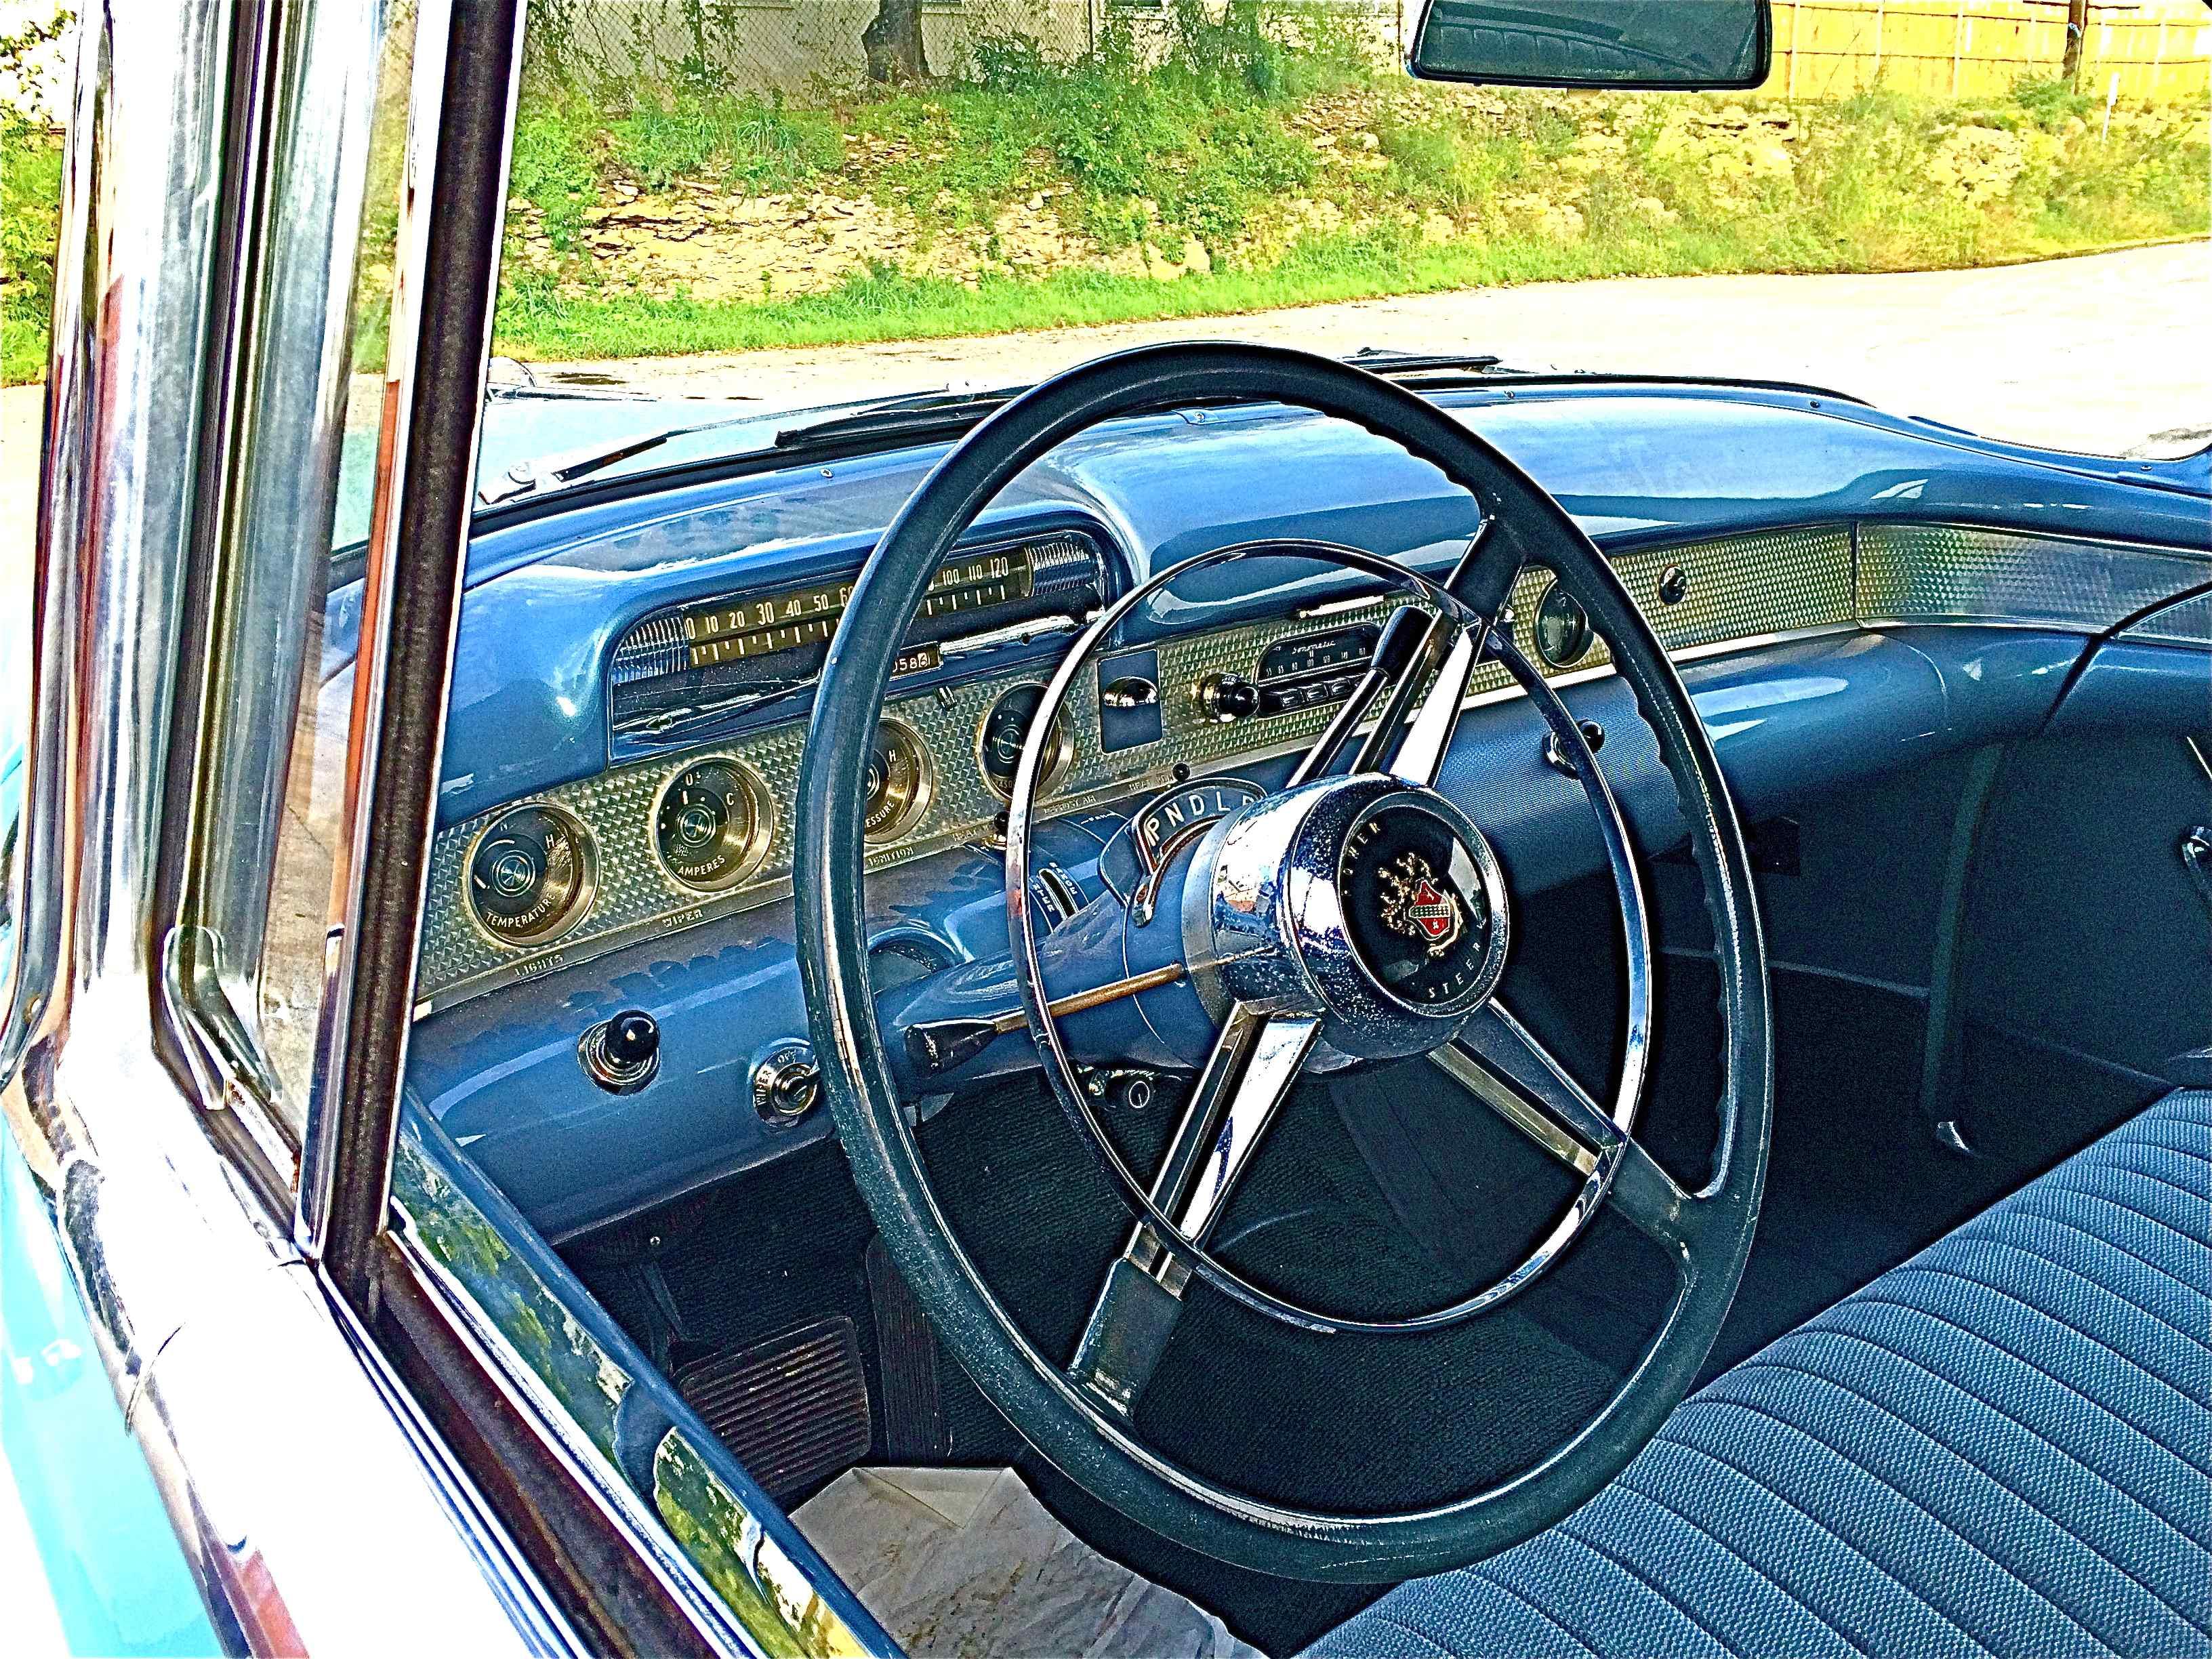 South Texas Gmc >> Impressive 1954 Buick Roadmaster at Austin Speed Shop ...